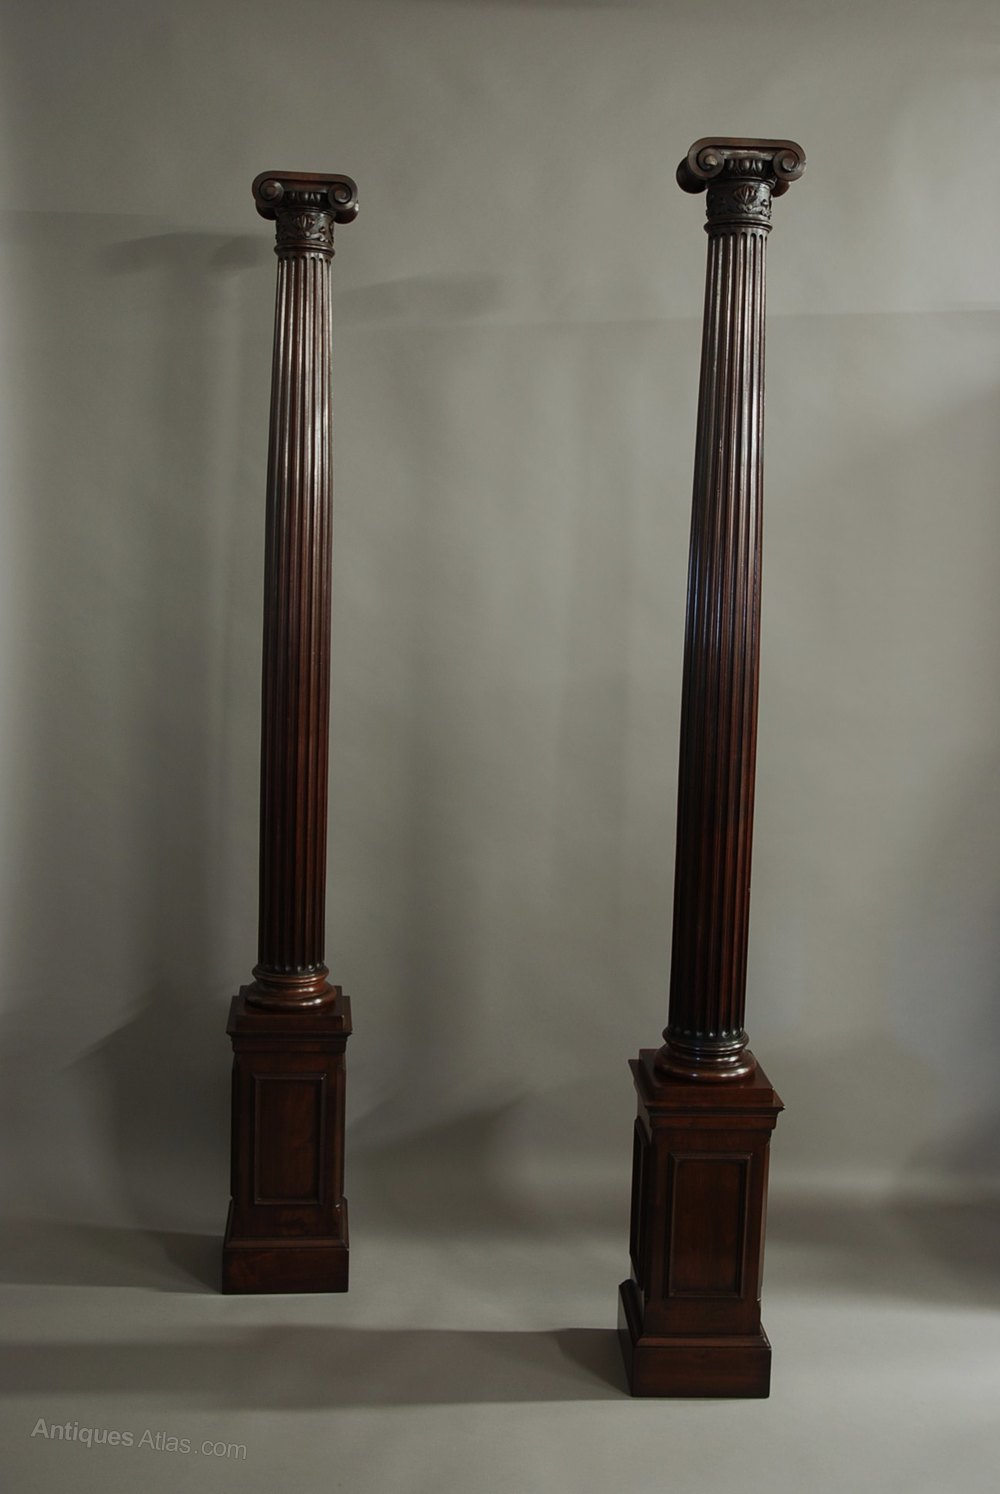 Antiques atlas pair of decorative walnut ionic columns for Decorative column